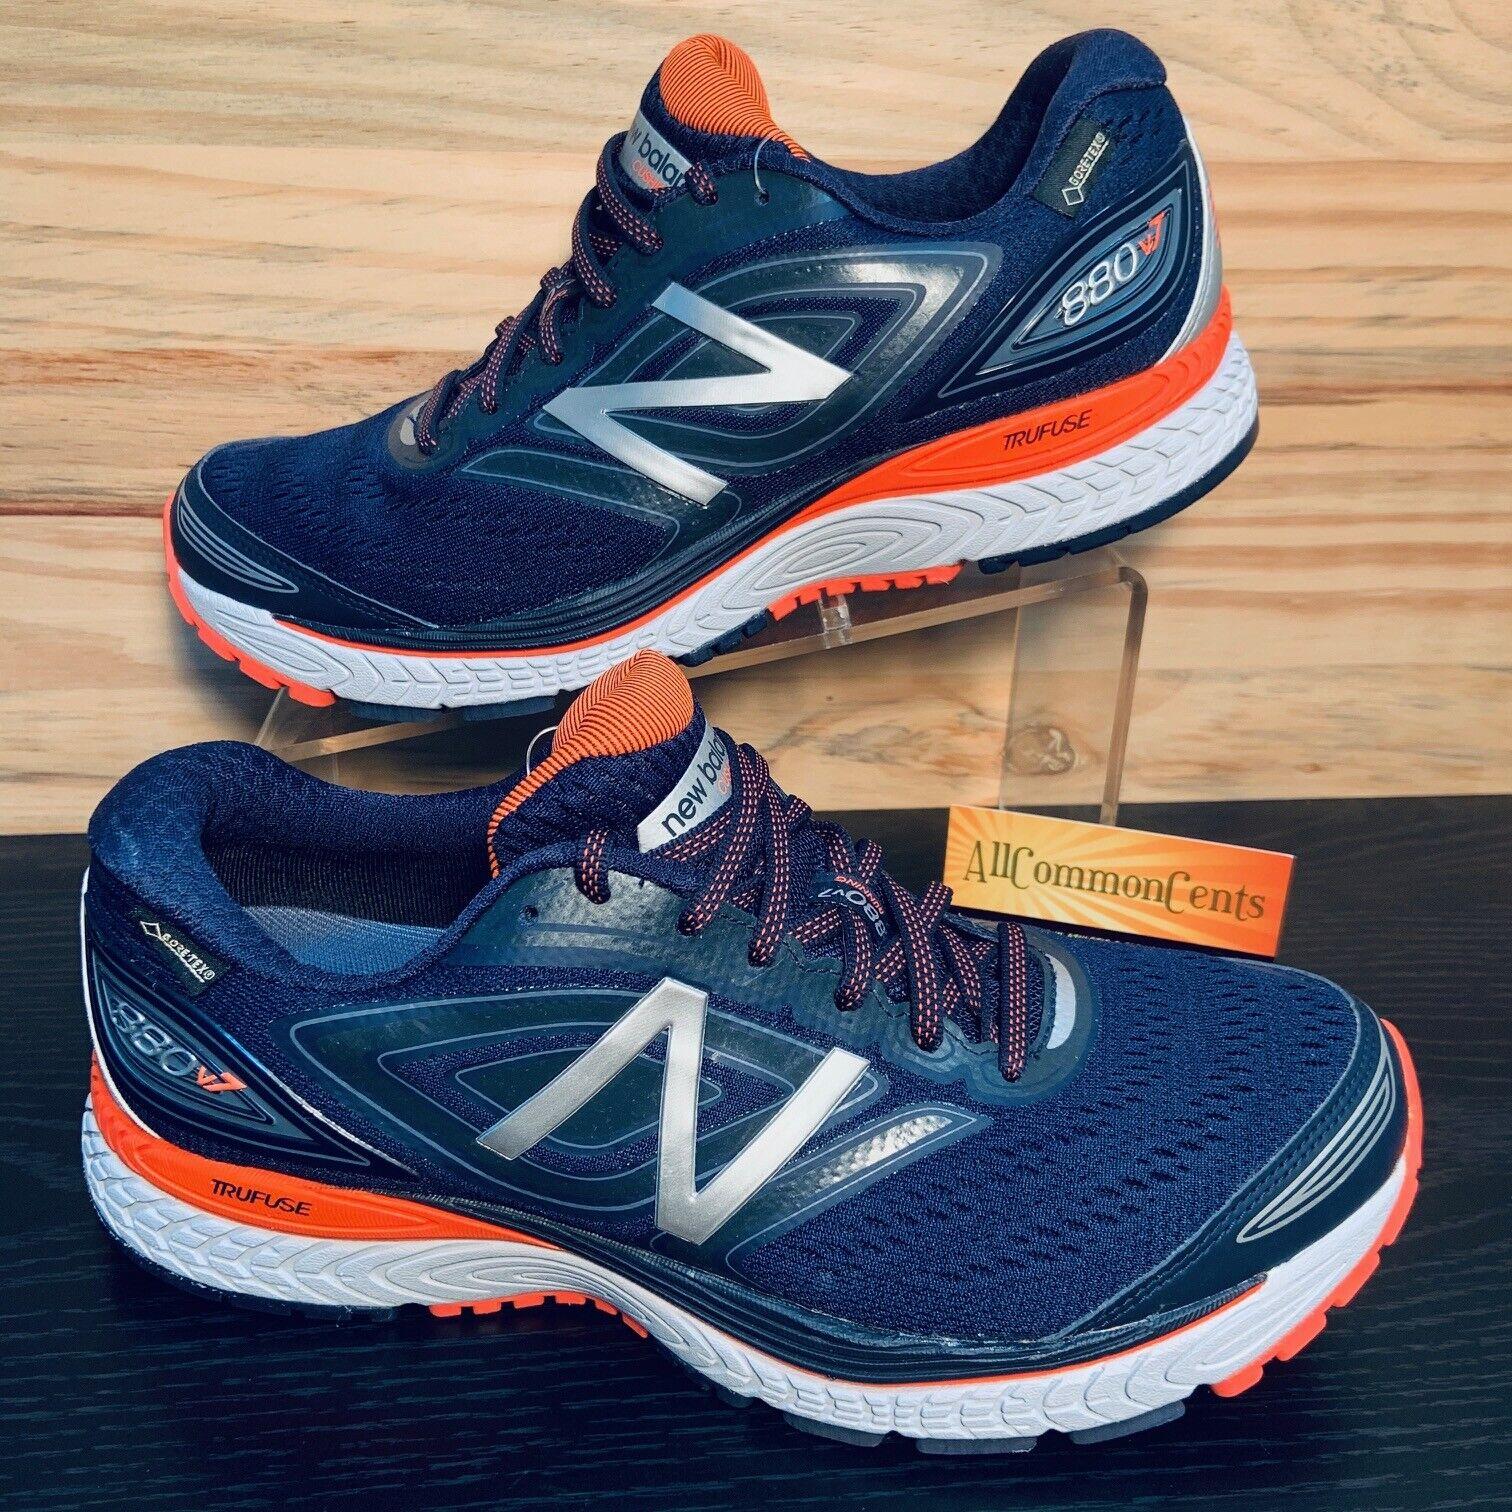 New Balance 880 V7 Gore-Tex Men's Running Shoes Size 8.5 Nav